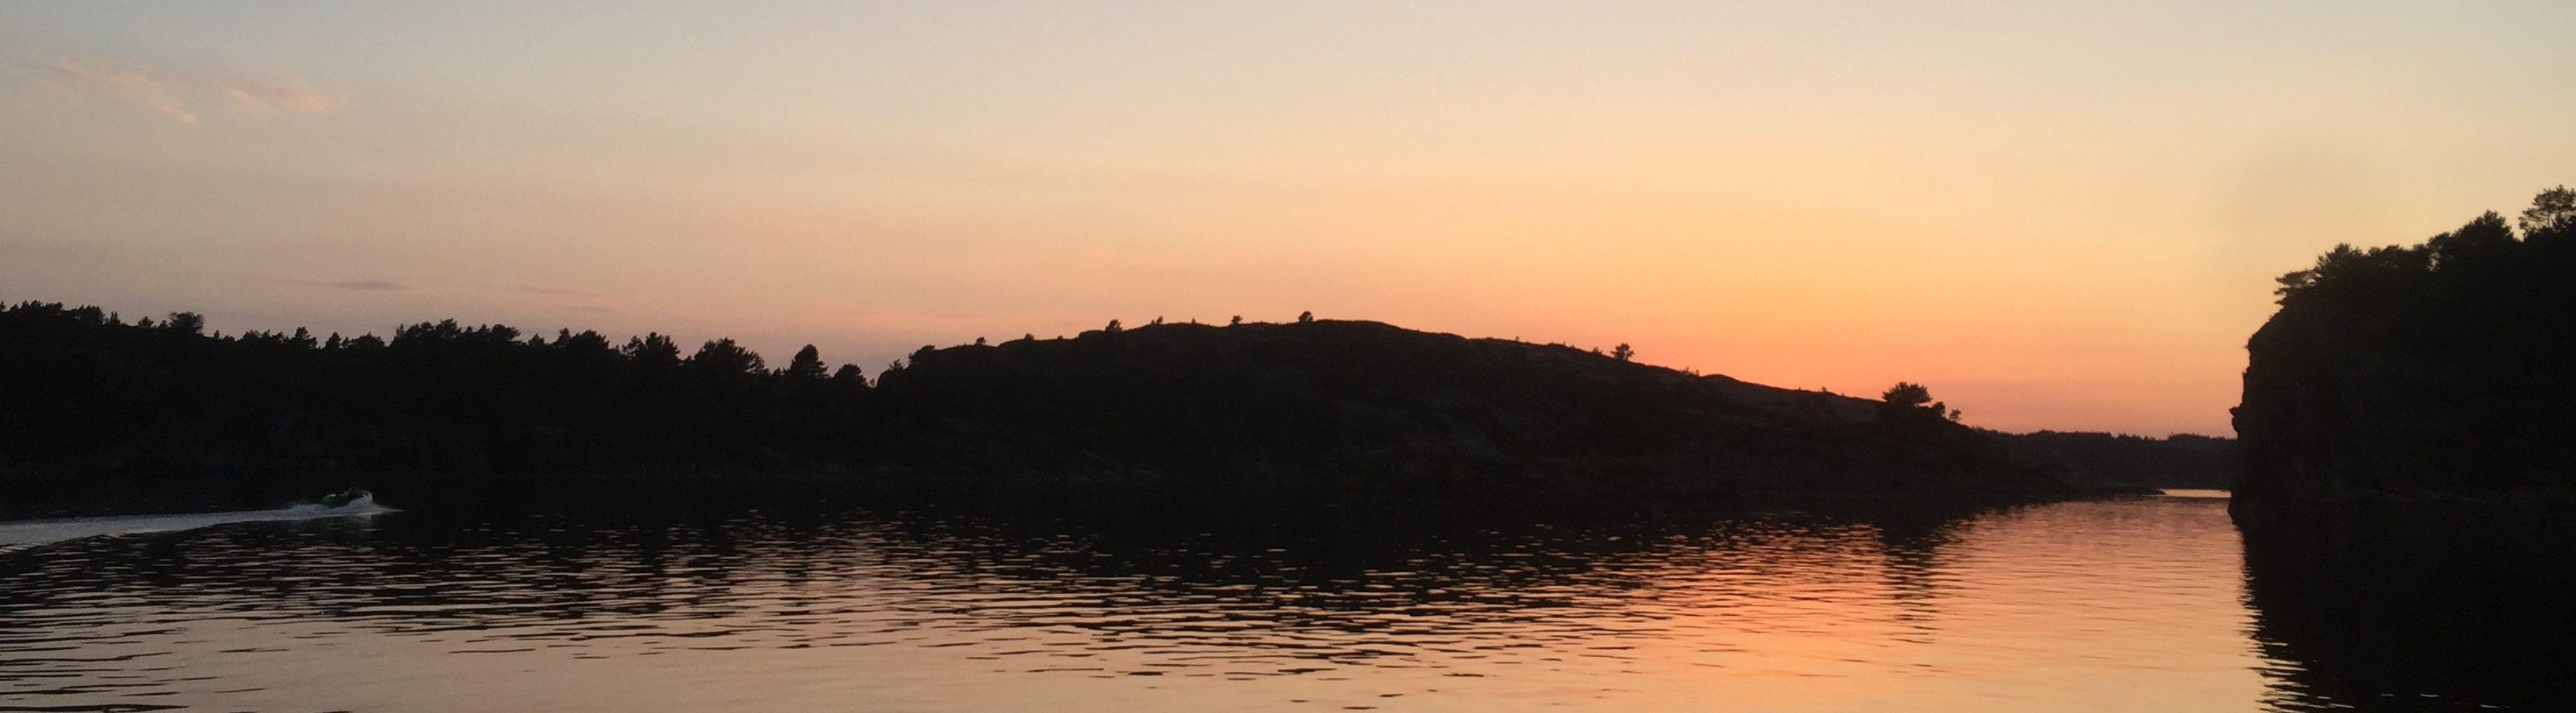 Frøisland